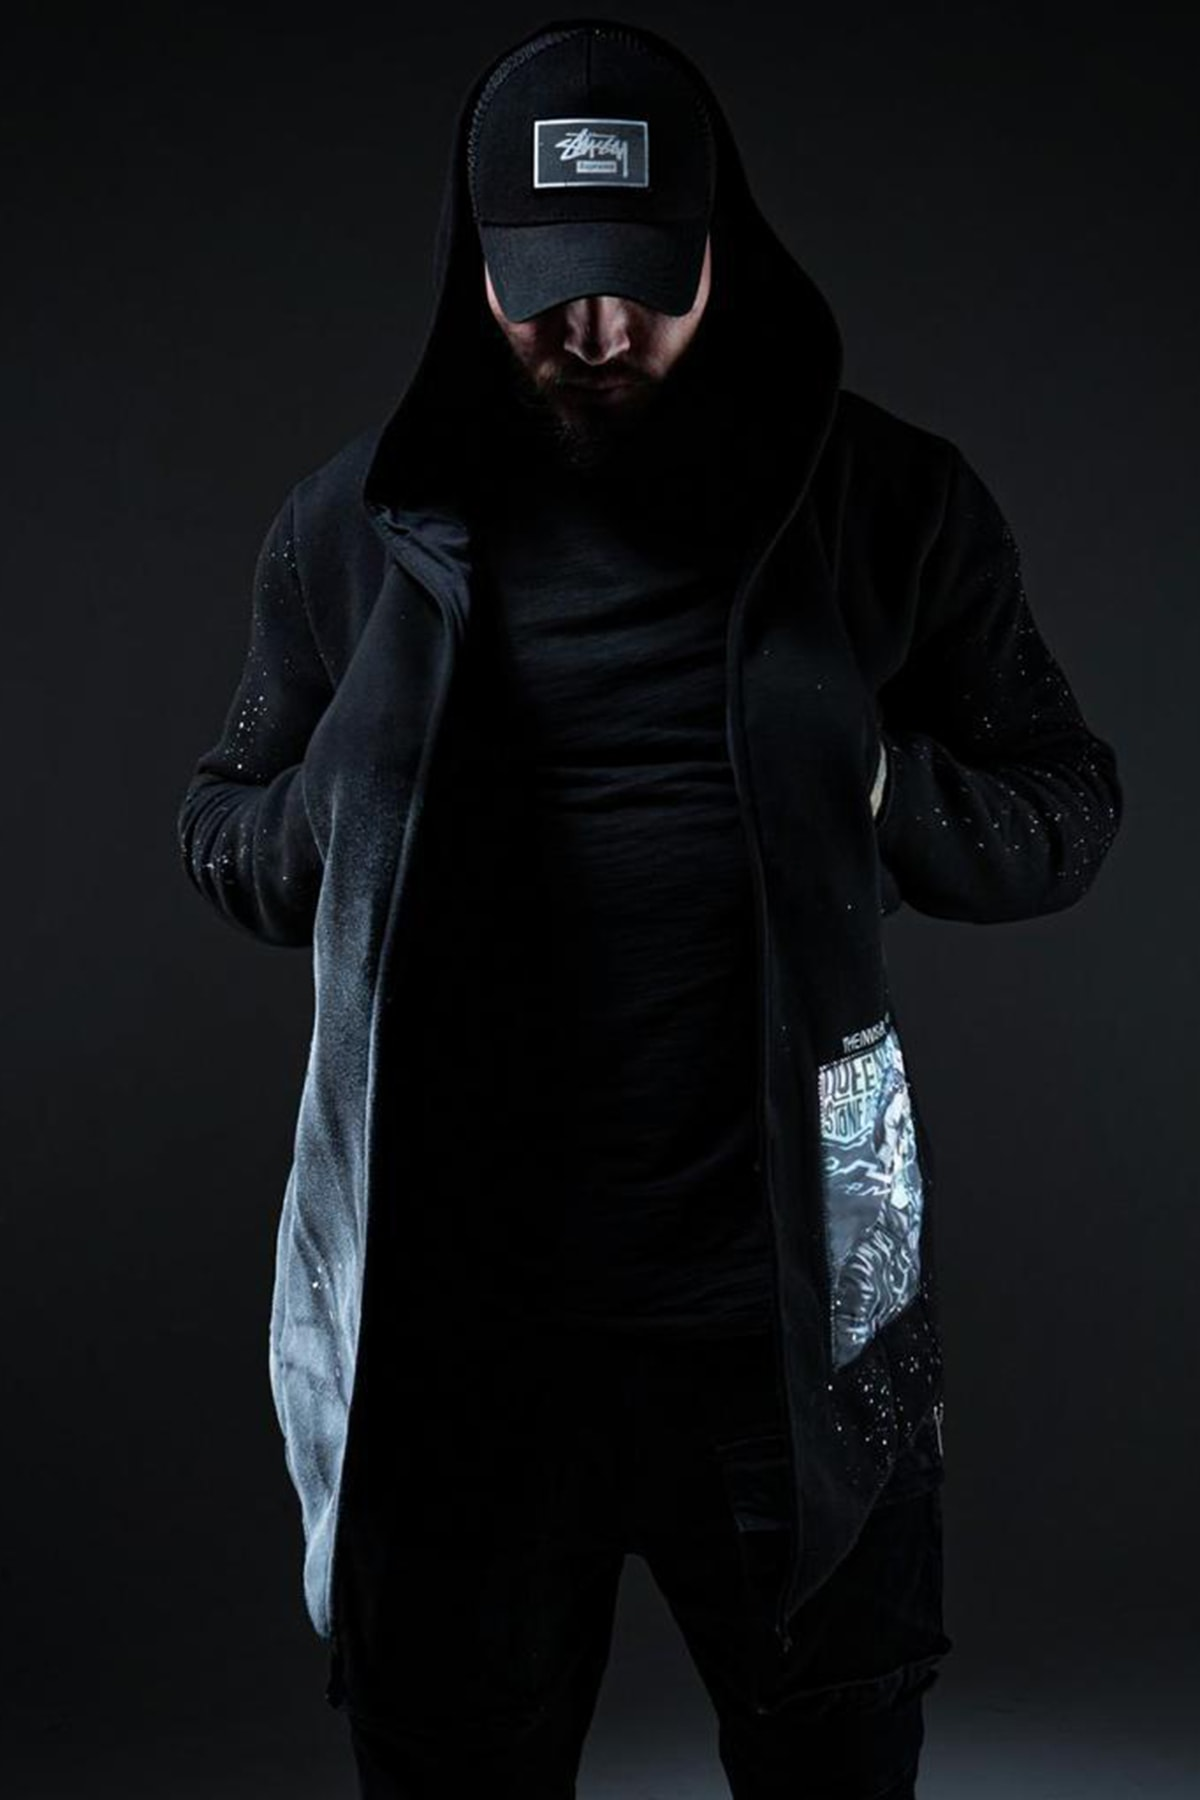 XHAN Siyah Kamuflaj Baskılı Sweatshirt 1KXE8-44333-02 2